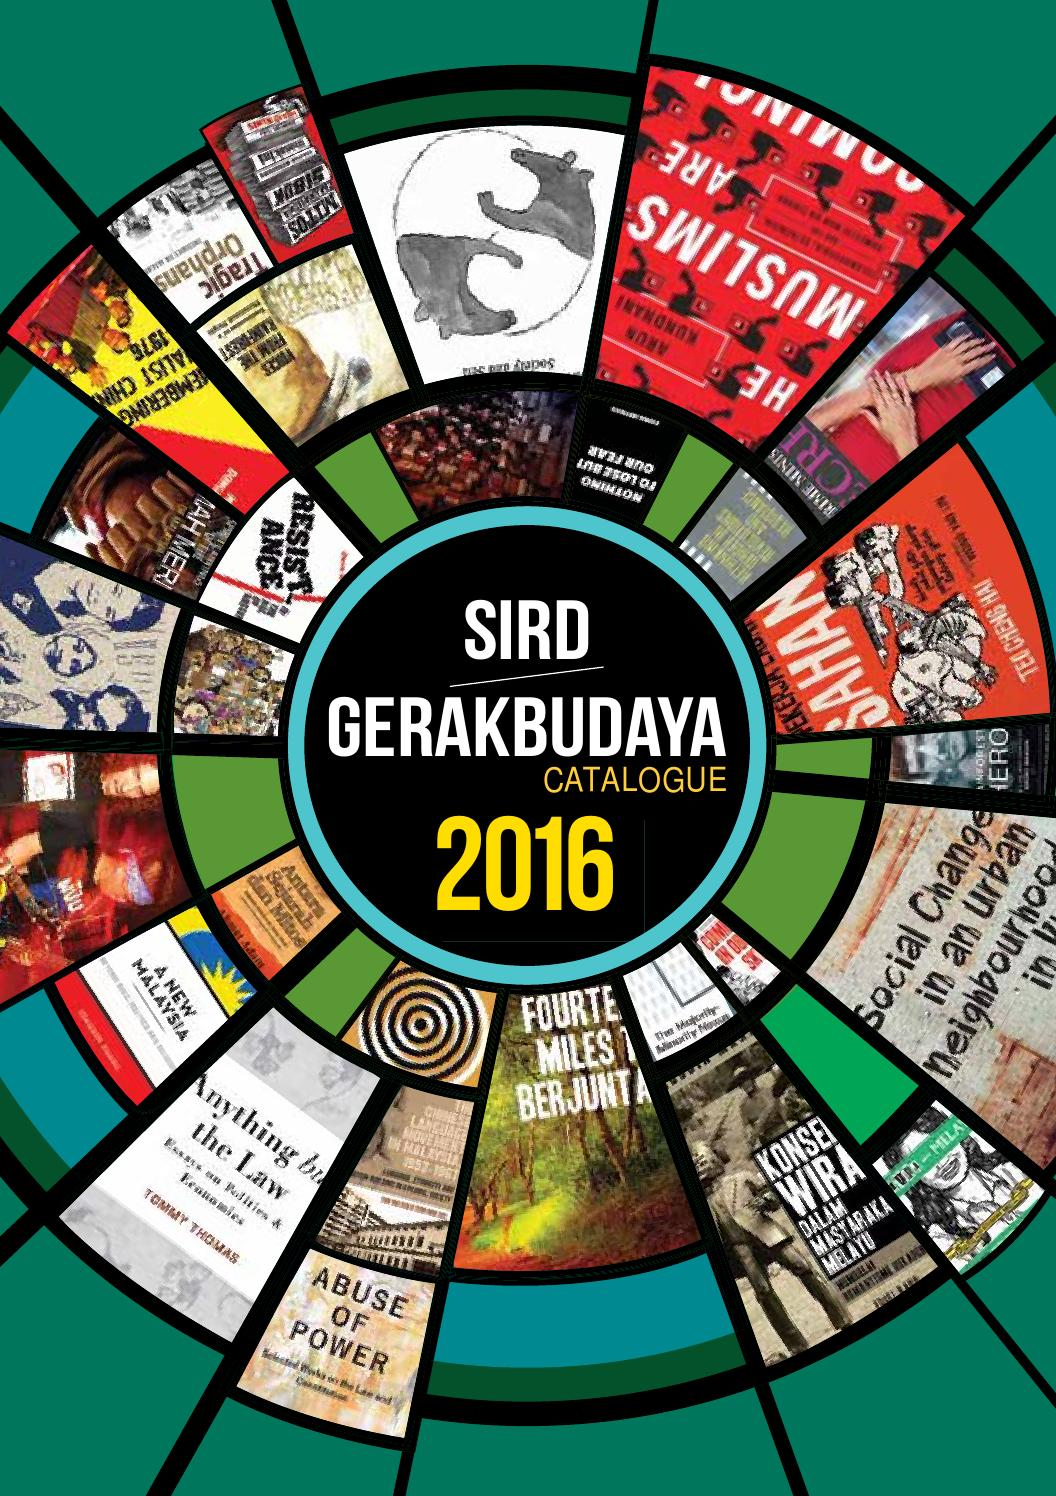 Gerakbudaya Catalogue 2016 By Issuu Toyo Open Country A T 275 60 R20 Pembuatan Tahun 2013